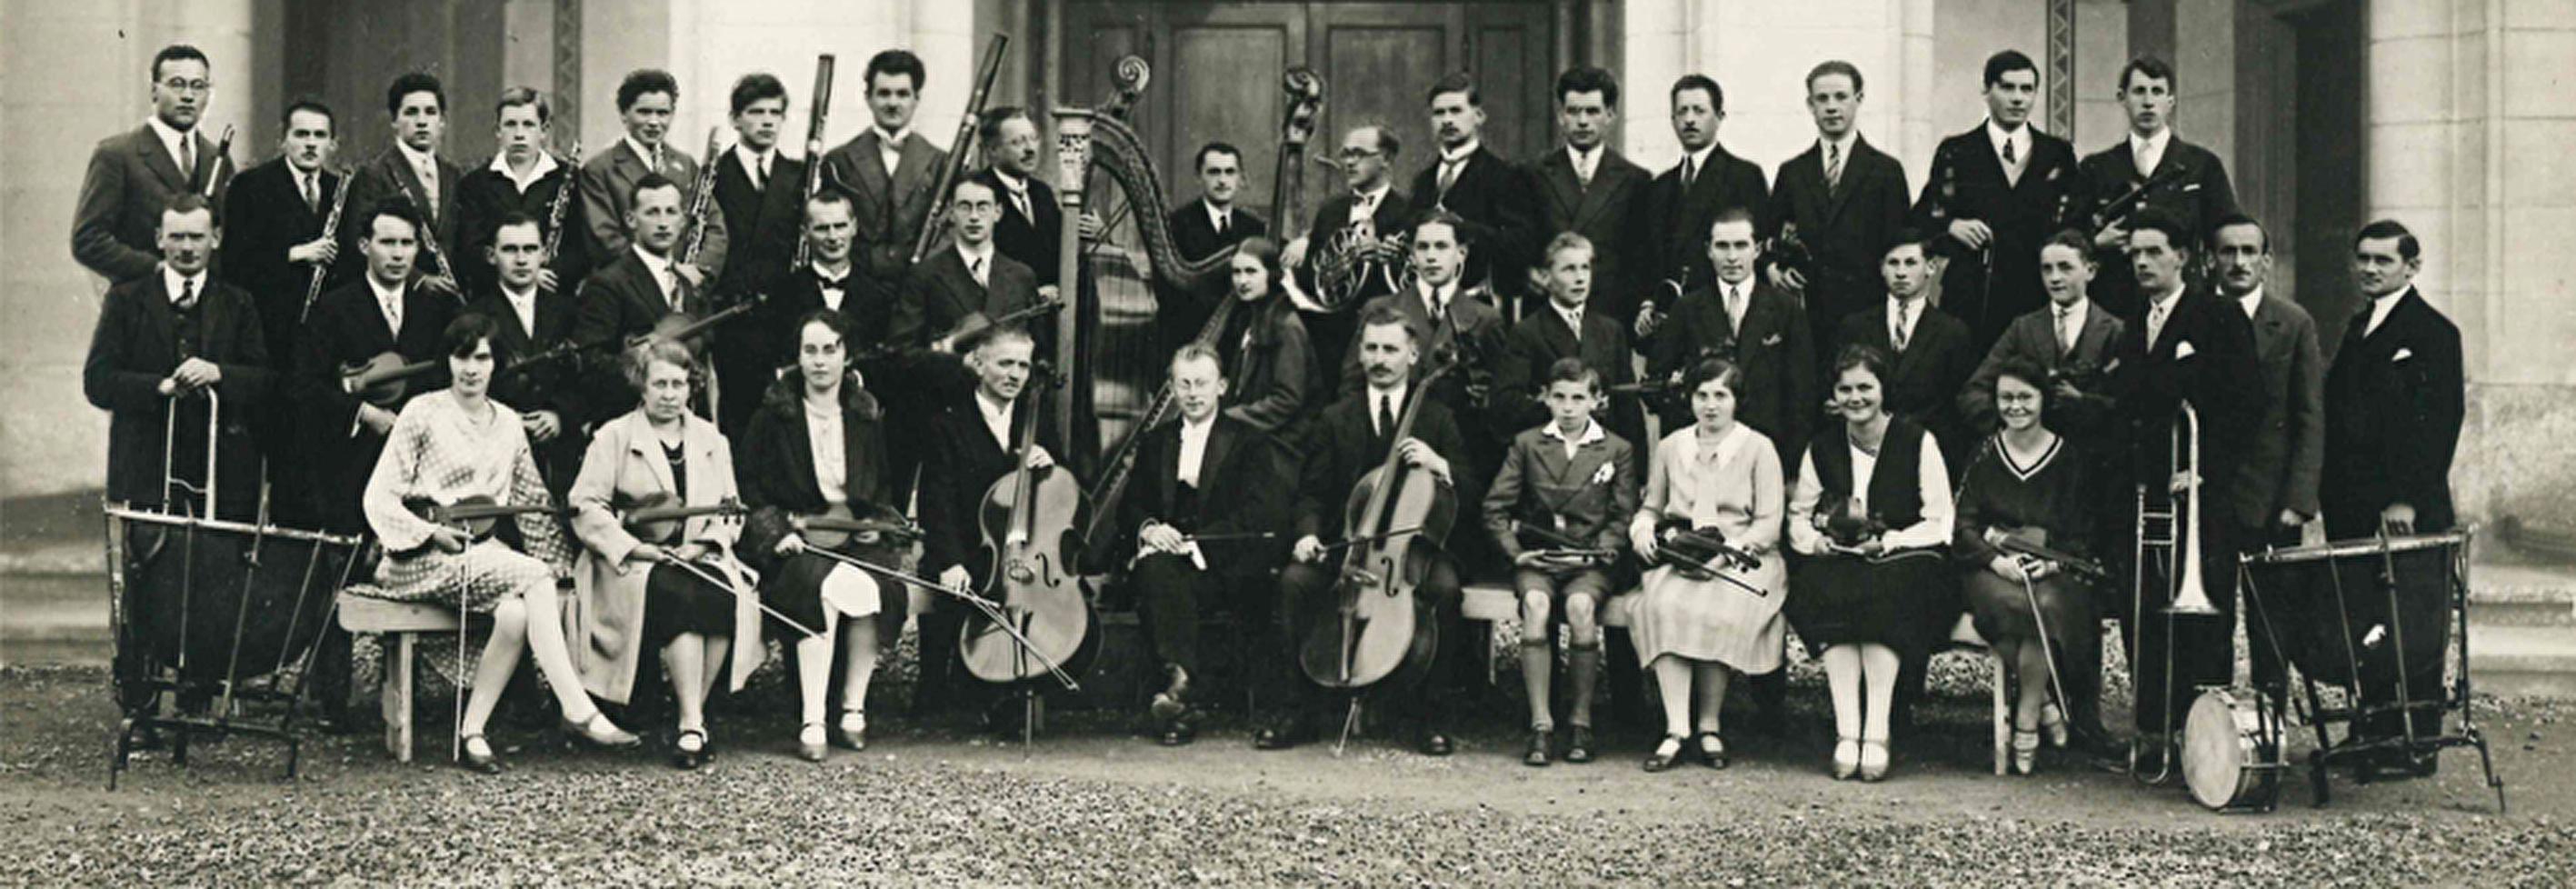 Orchesterverein Littau-Reussbühl